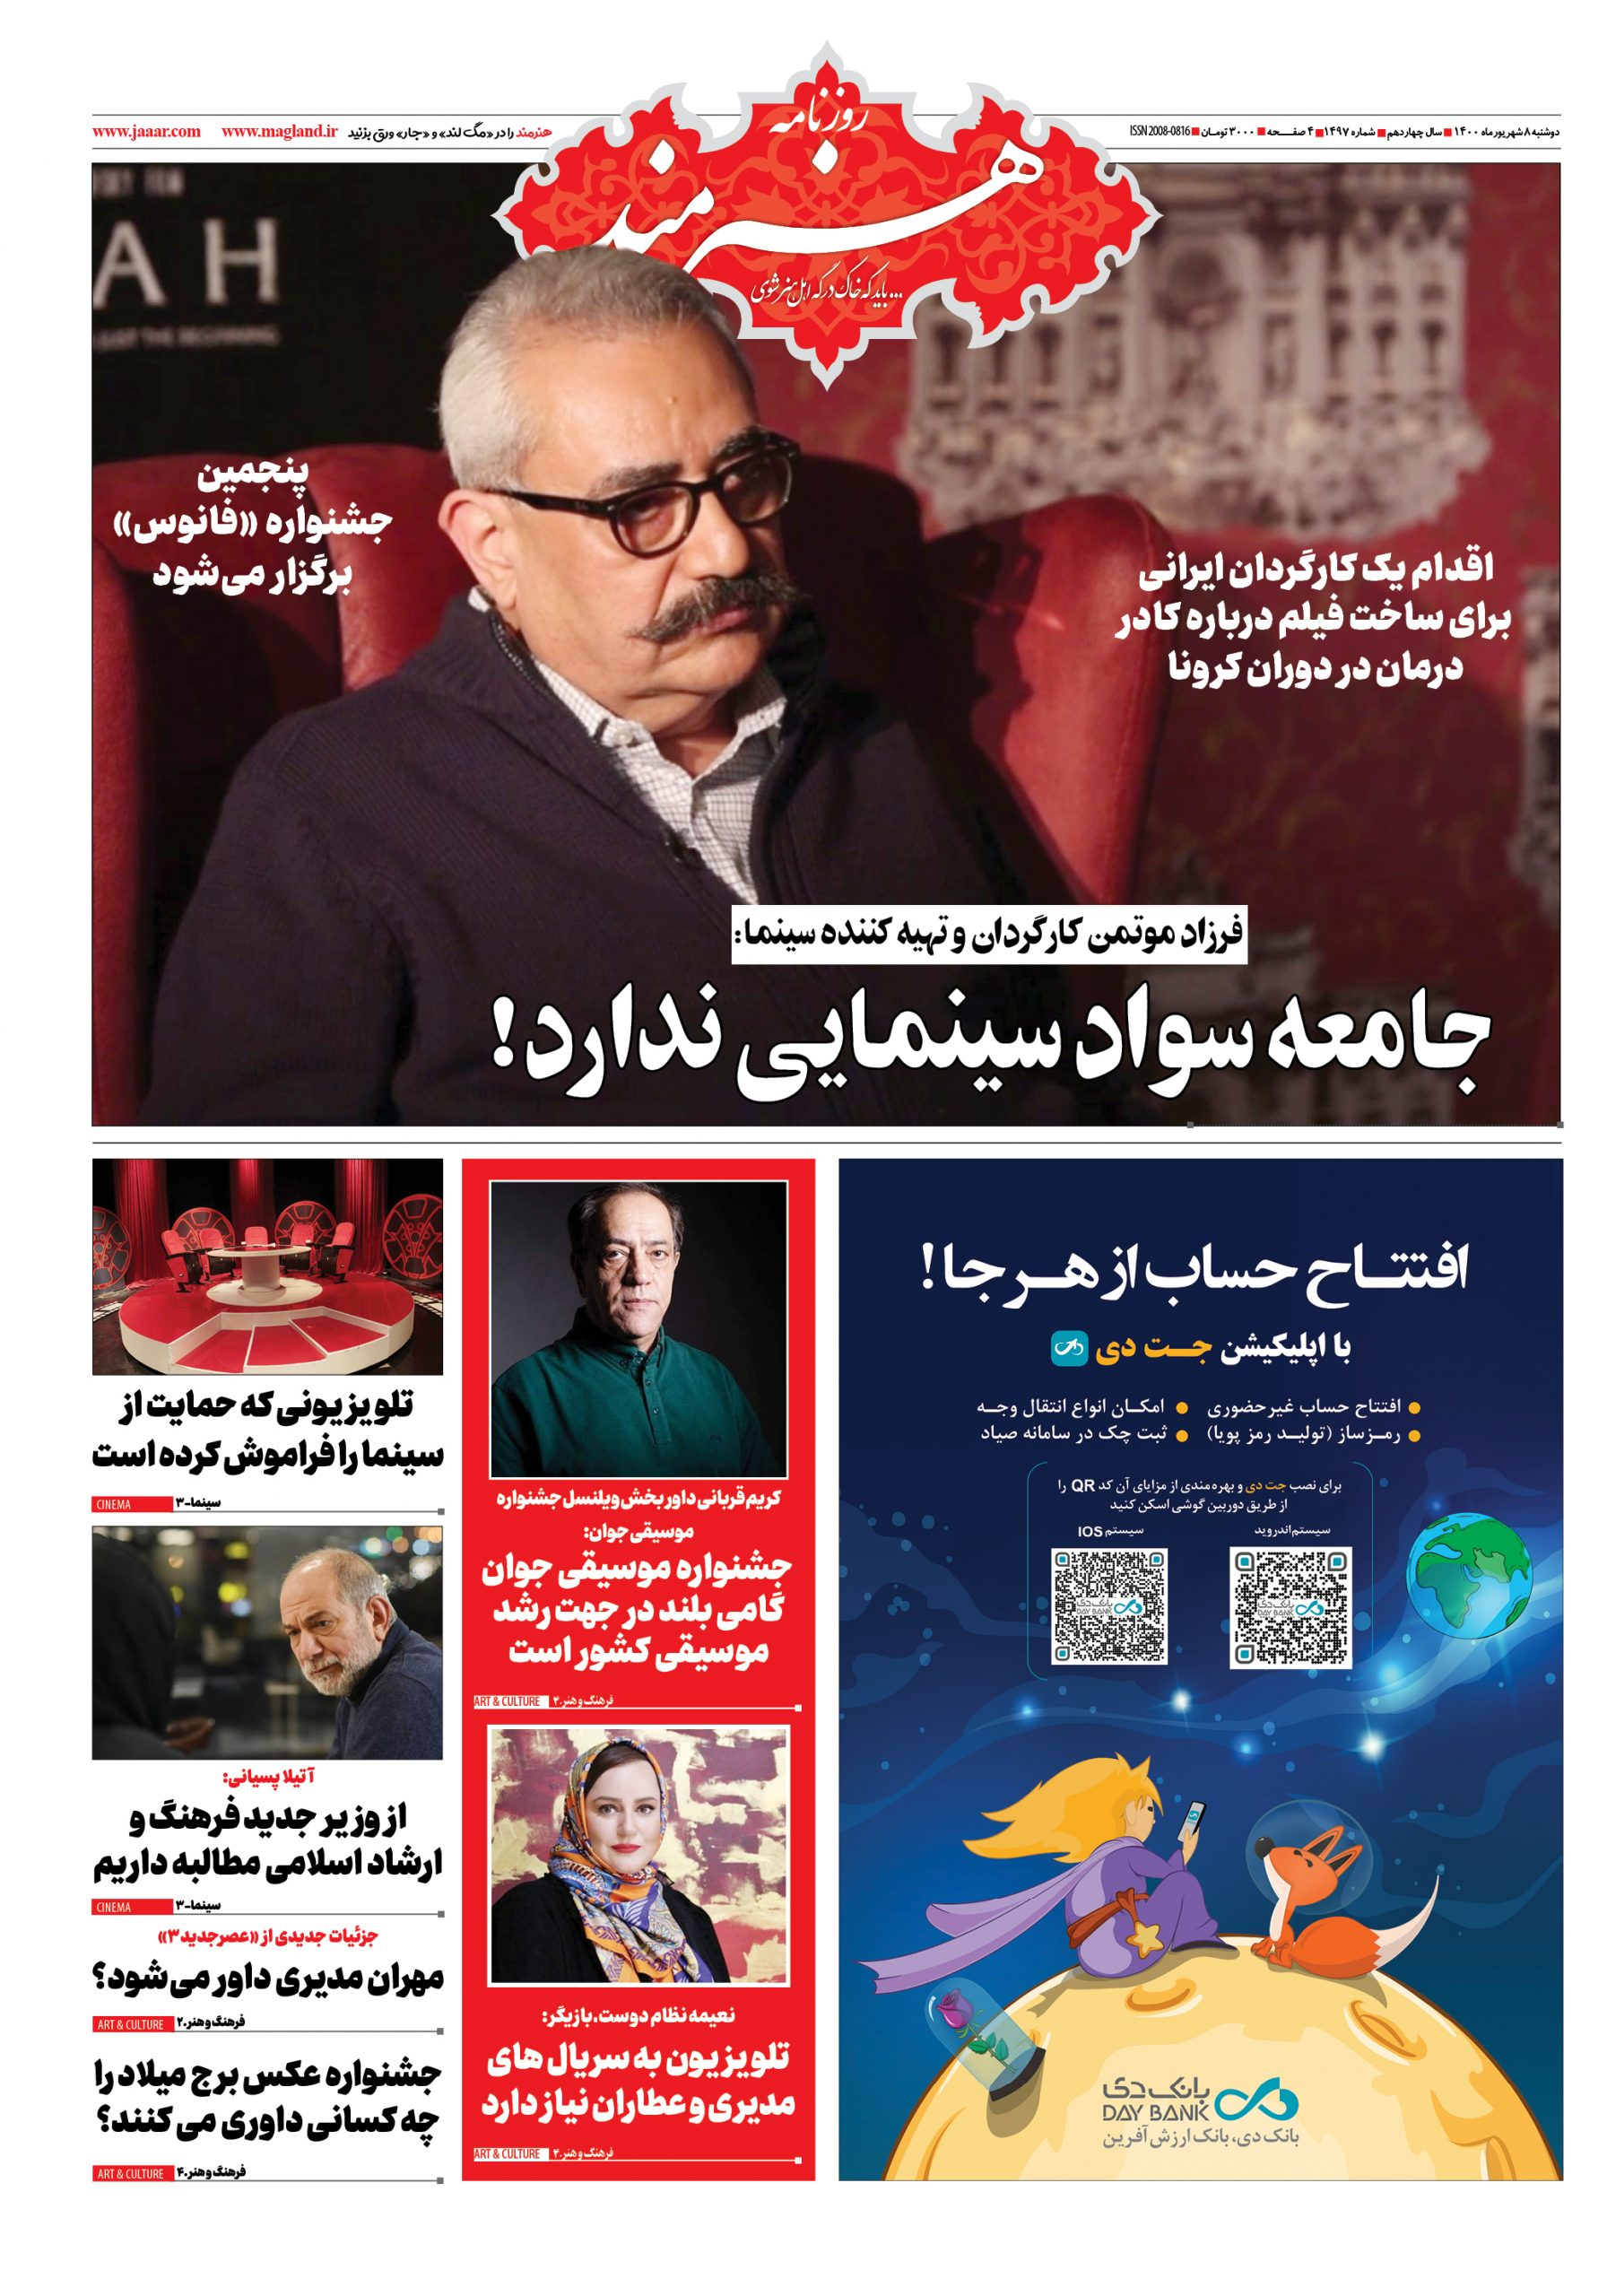 روزنامه هنرمند فرزاد موتمن